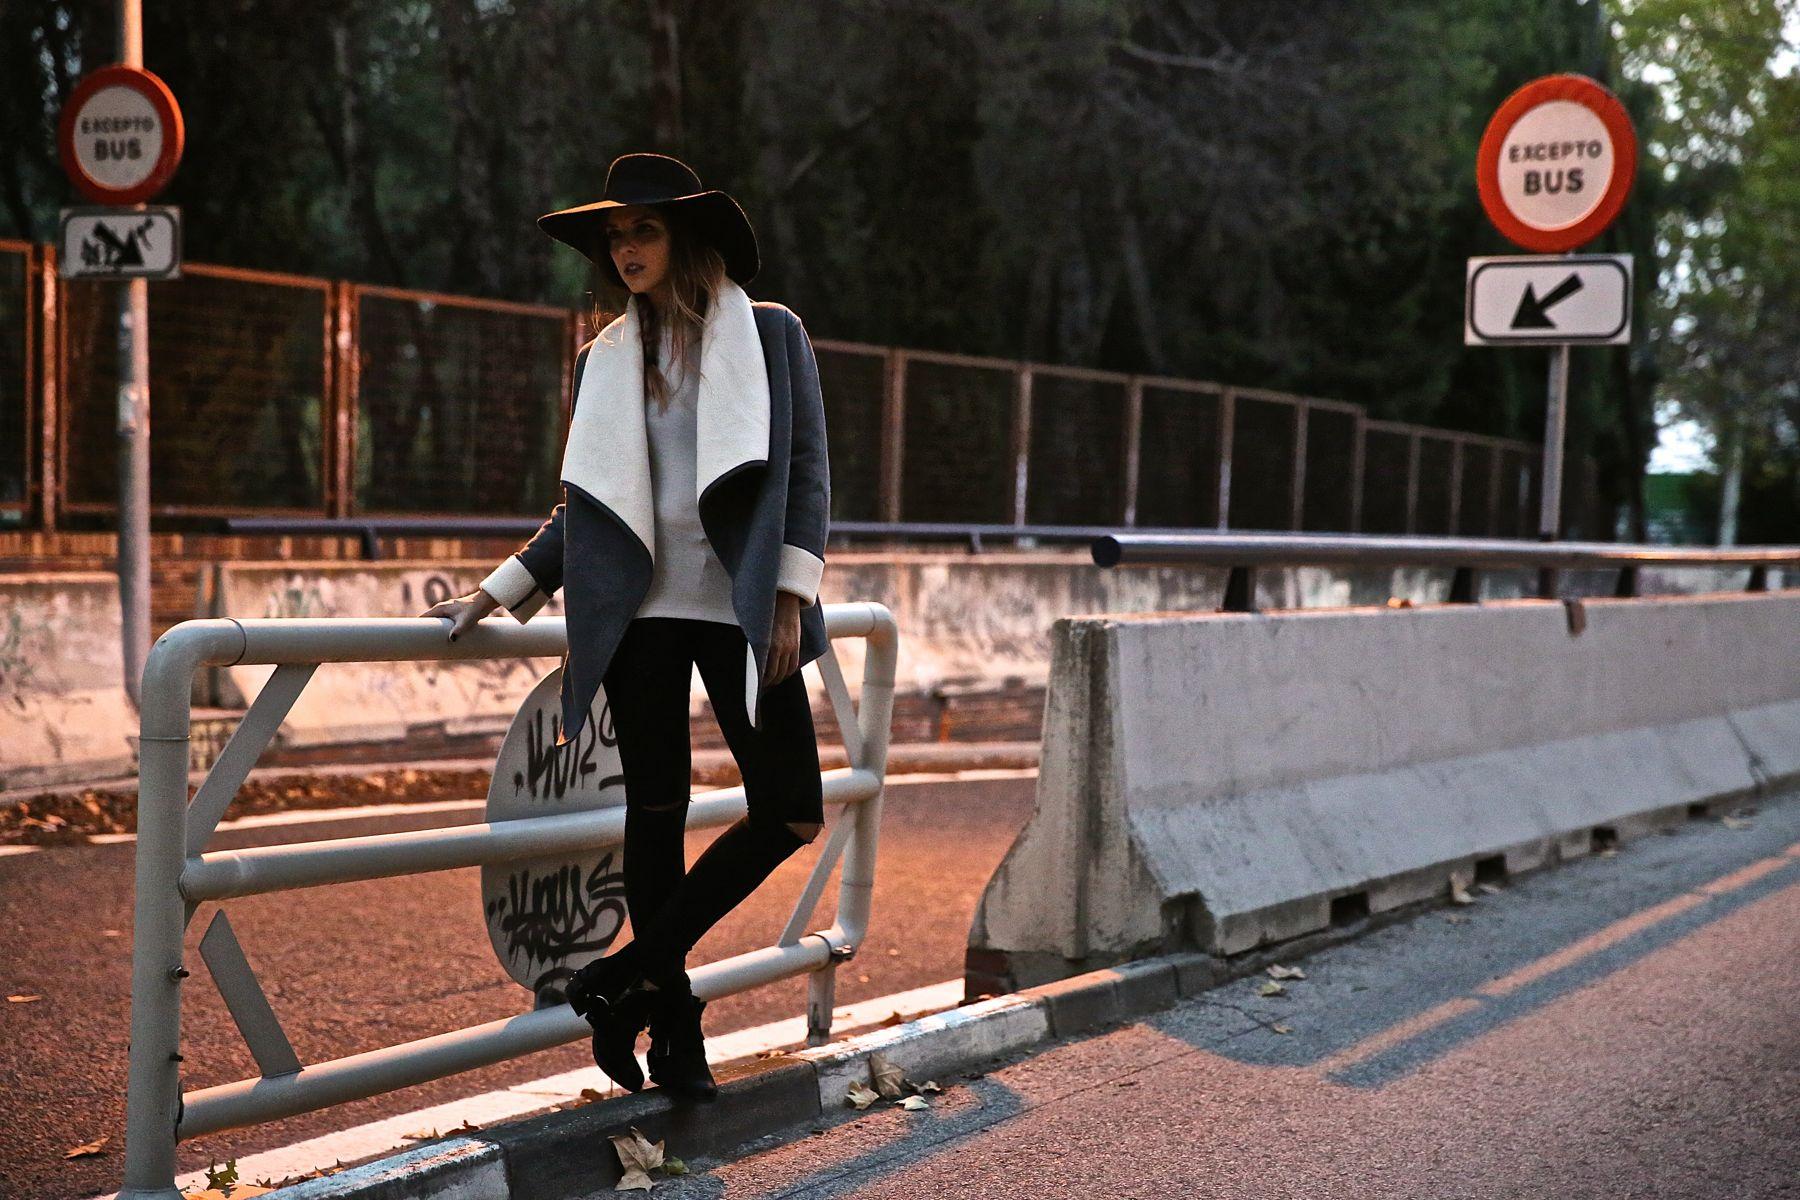 trendy_taste-look-outfit-street_style-ootd-blog-blogger-fashion_spain-moda_españa-abrigo_borrego-borreguillo-otoño-frio-cold-hat-sombrero-boho-hippie-steve_madden-skinny_jeans-pitillos-fall-3